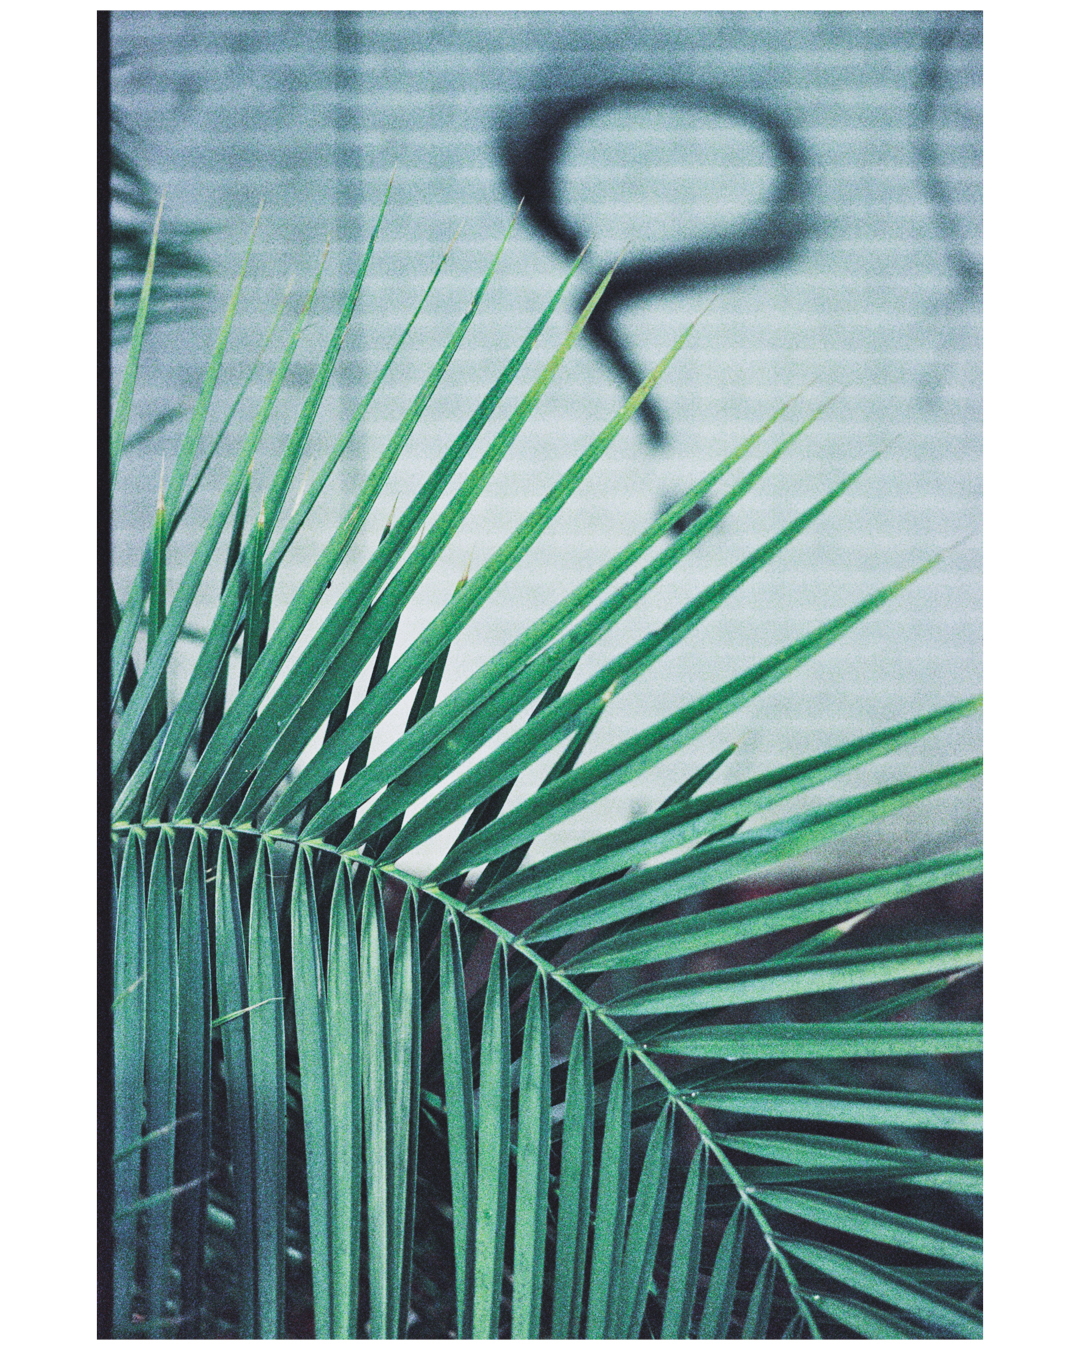 Film Photography Photo Walk 35mm - South Africa - by Ken Treloar Photography-3.jpg